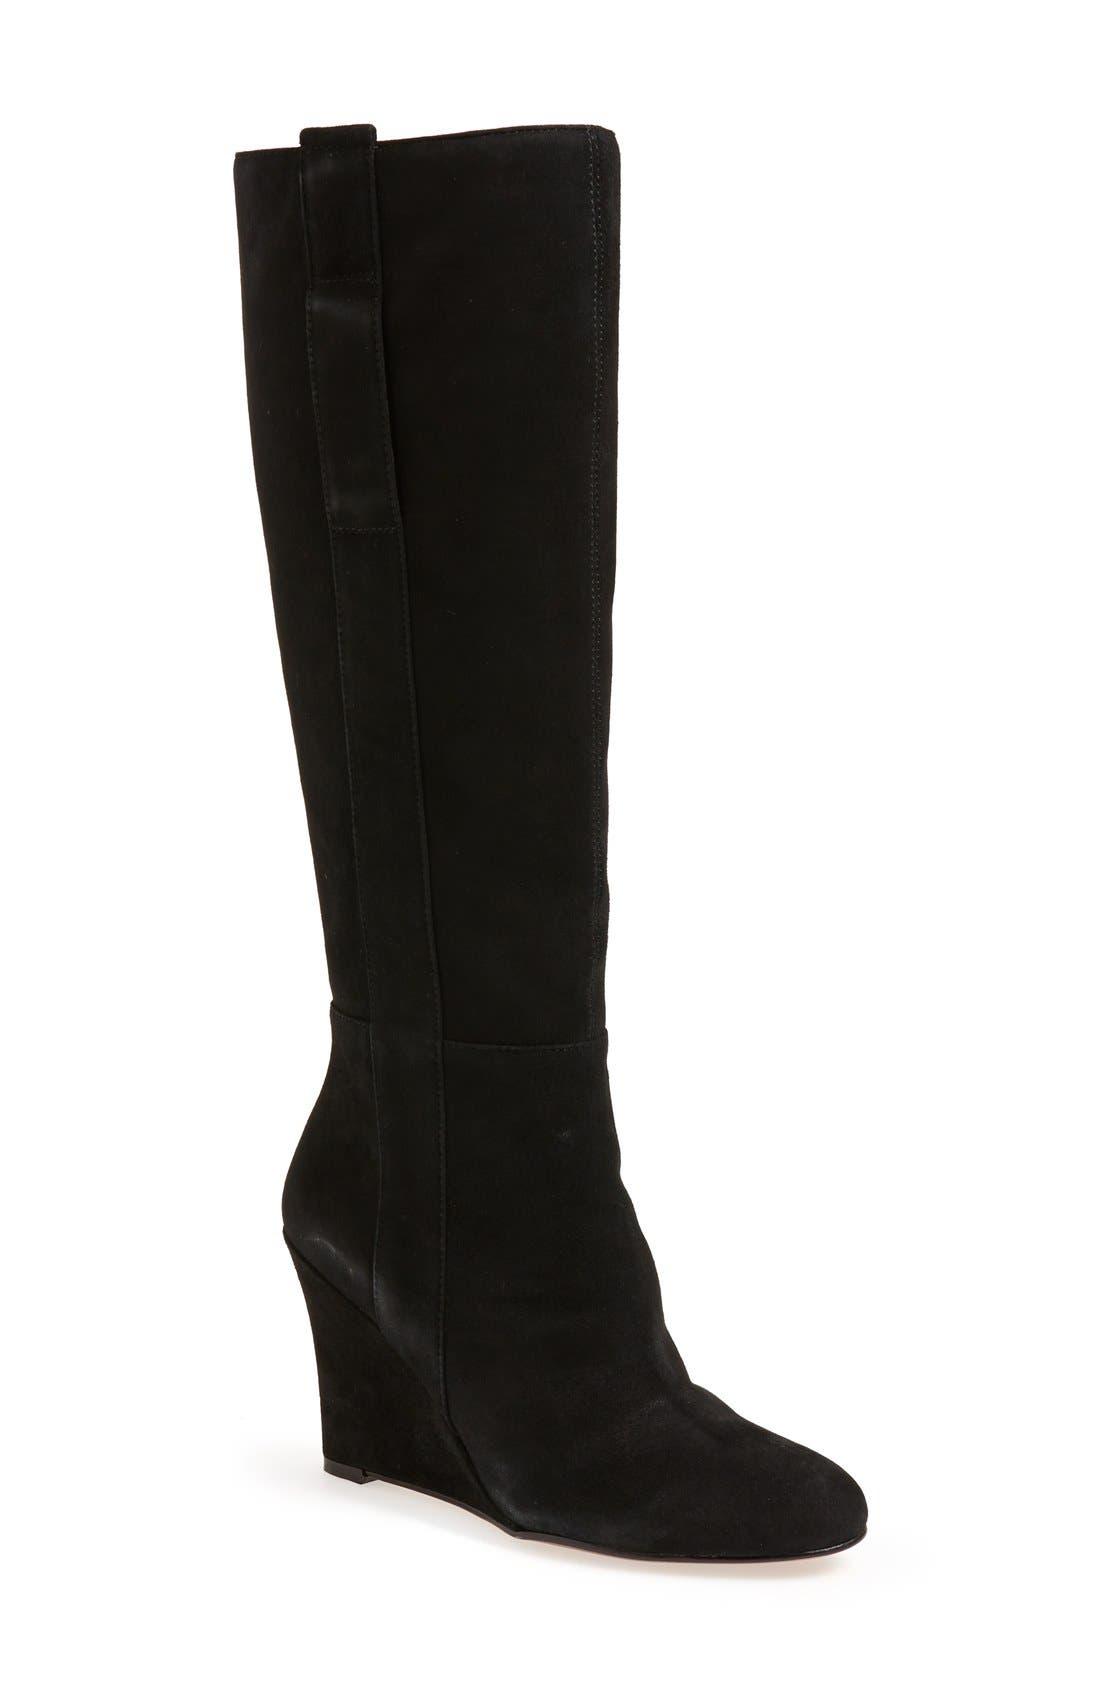 'Oran' Tall Wedge Boot, Main, color, 001